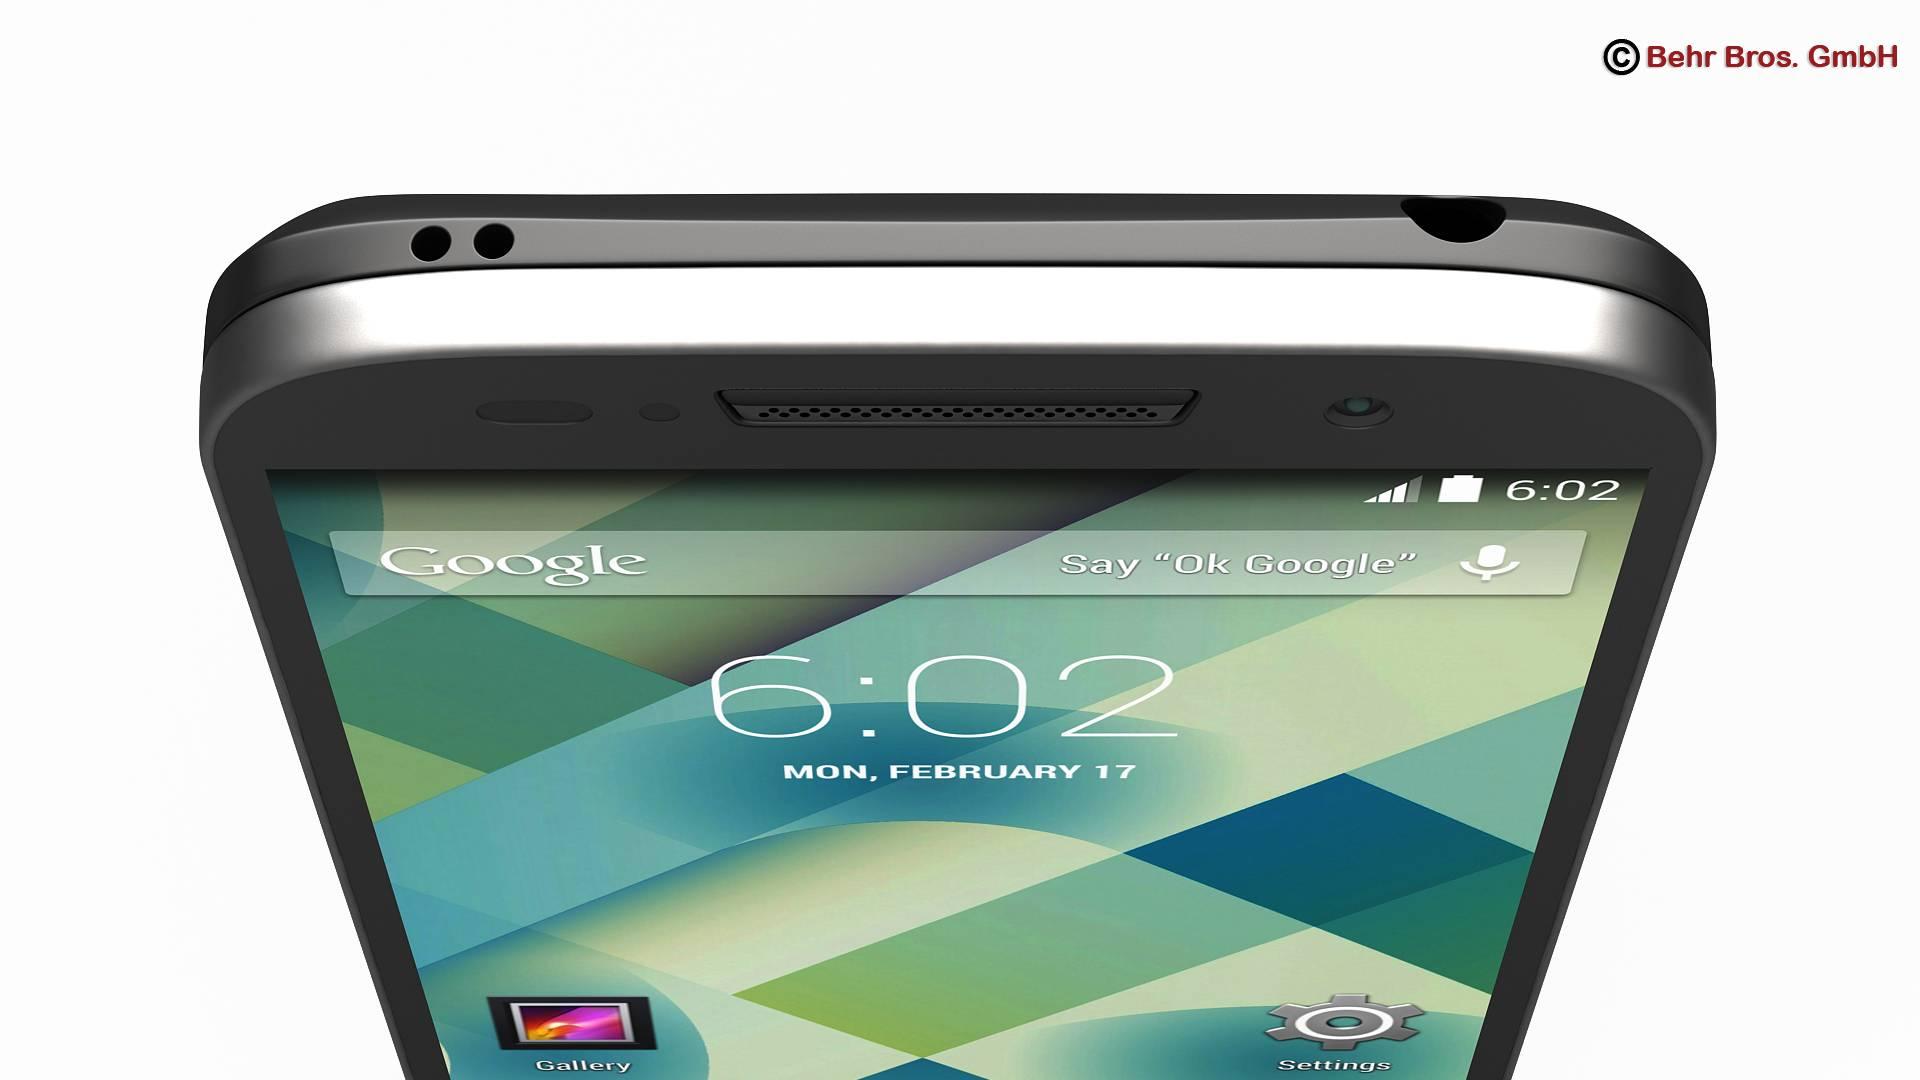 generic smartphone 4 inch 3d model 3ds max fbx c4d lwo ma mb obj 161625